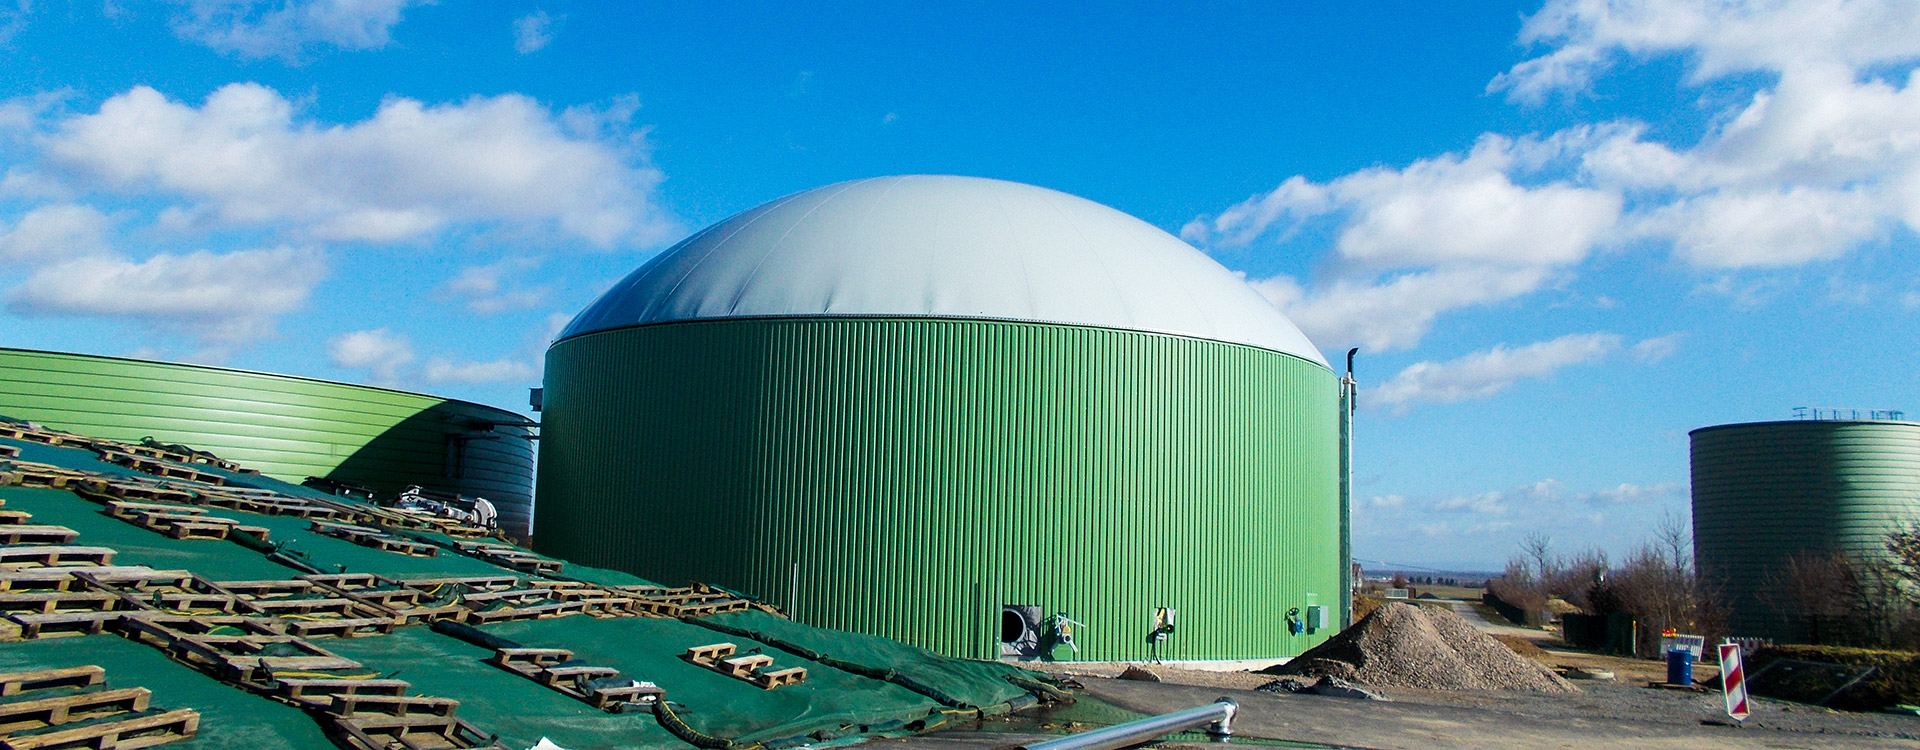 Lipp Eco-Digester industry - Lipp System